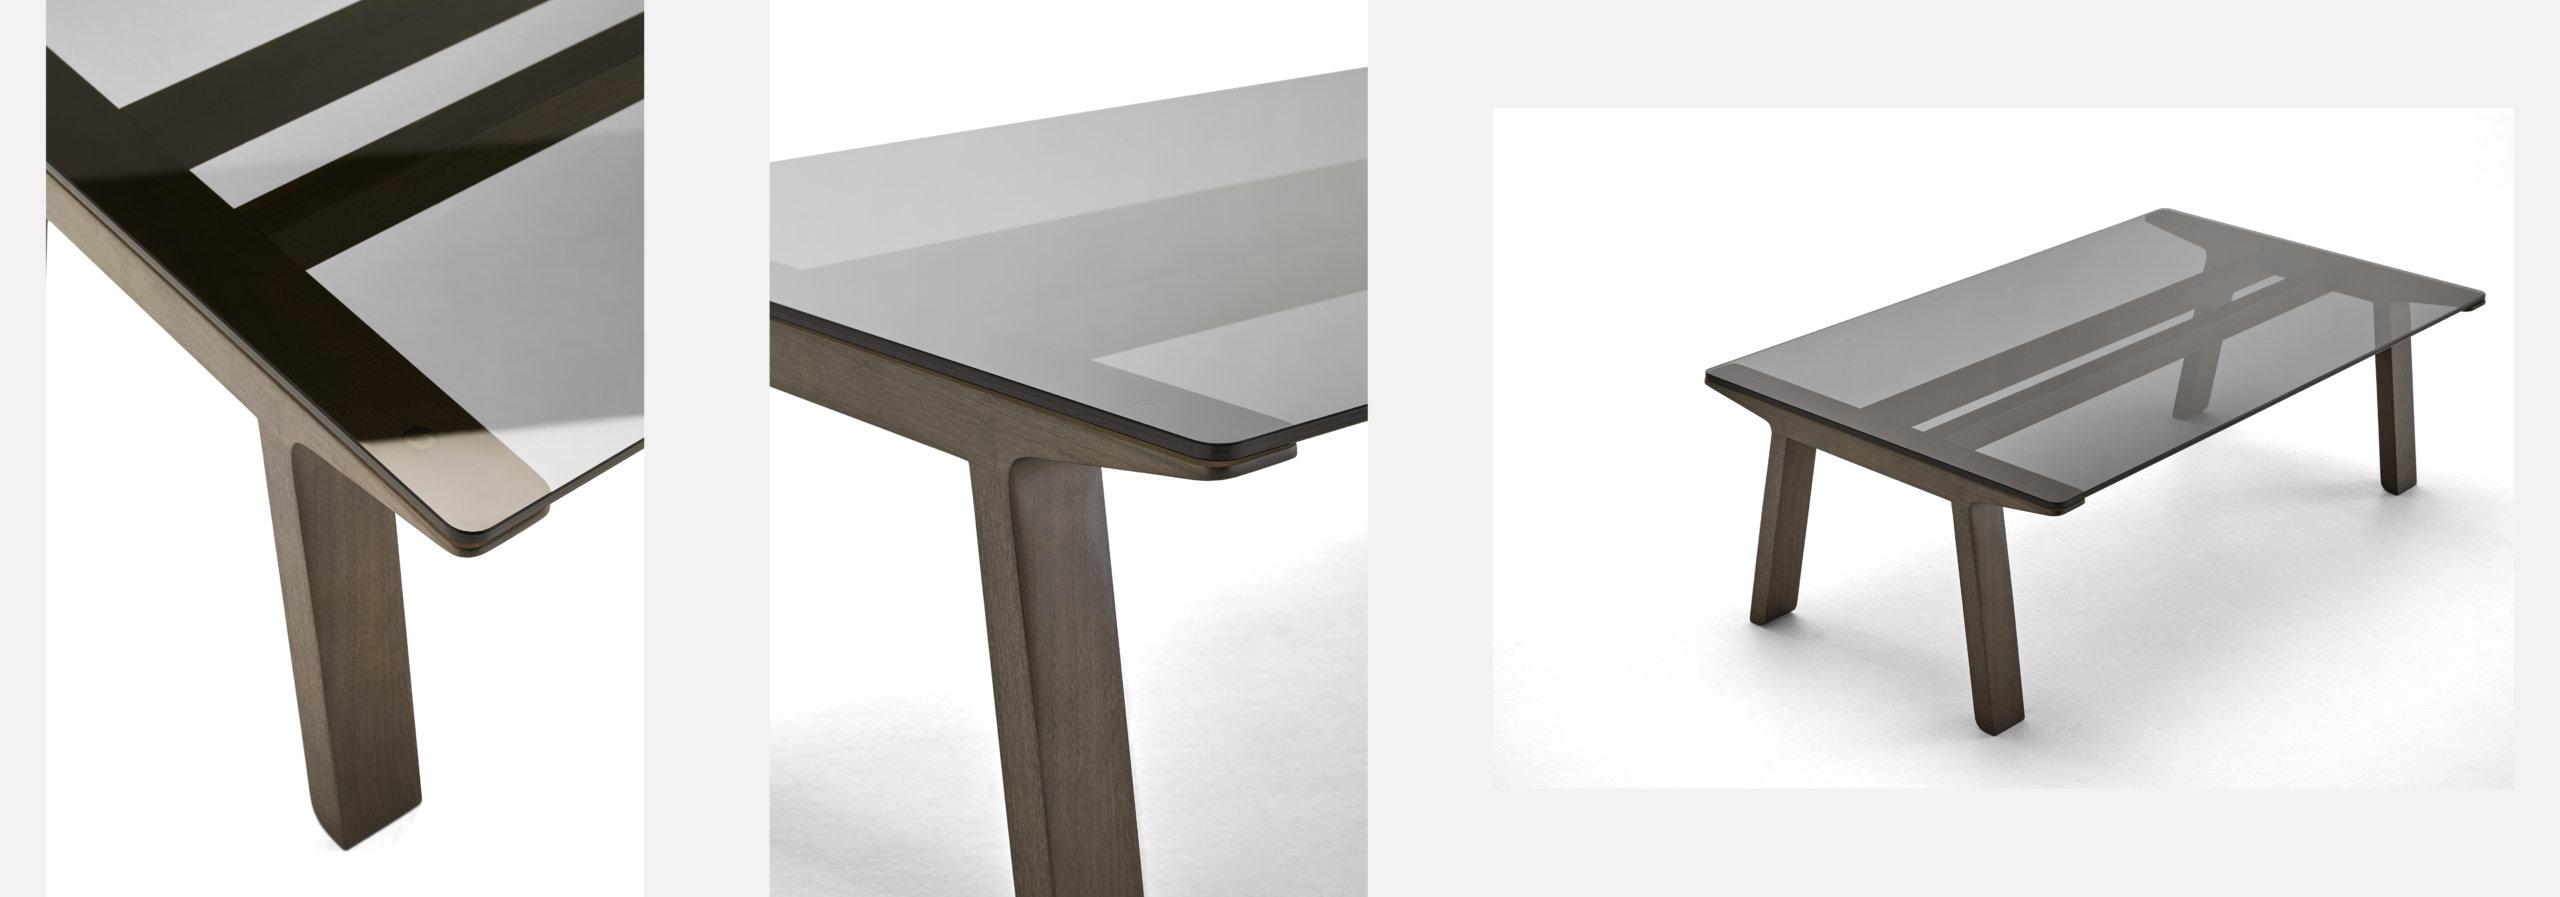 MITIS_COFFE_TABLE_SLIDE_3